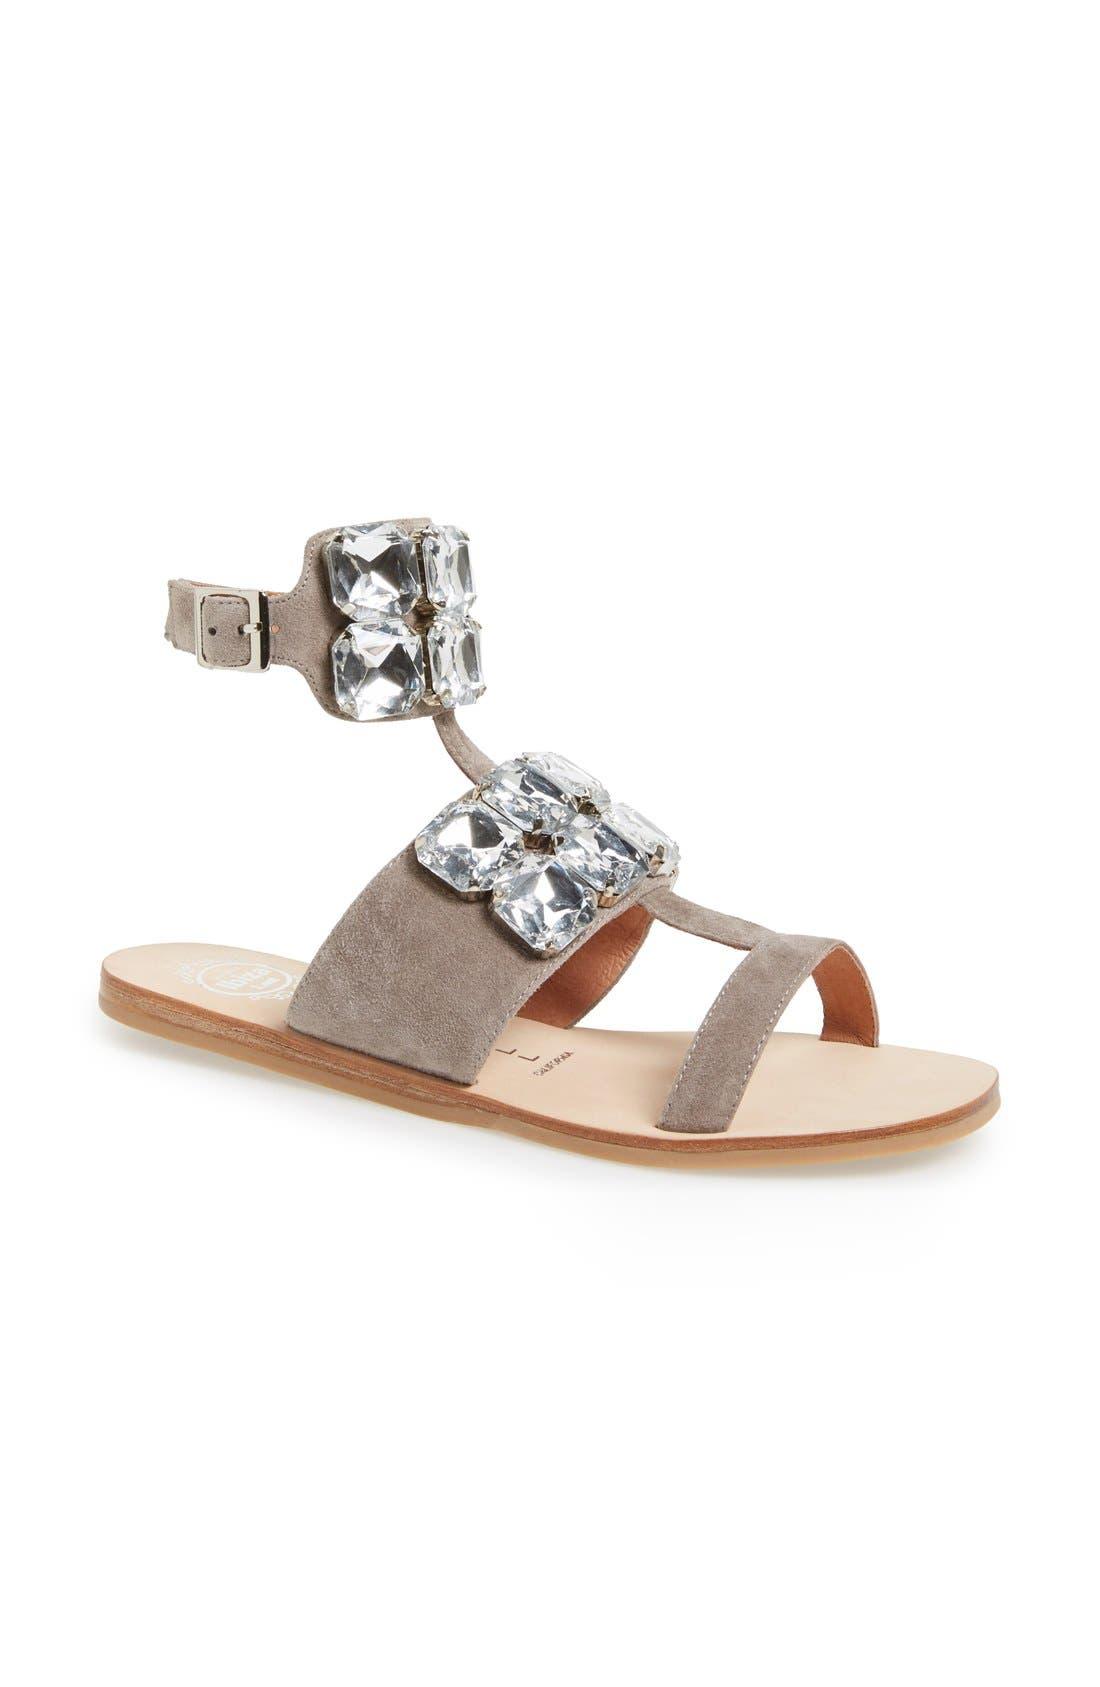 Alternate Image 1 Selected - Jeffrey Campbell 'Sabita' Jeweled Suede Ankle Strap Sandal (Women)